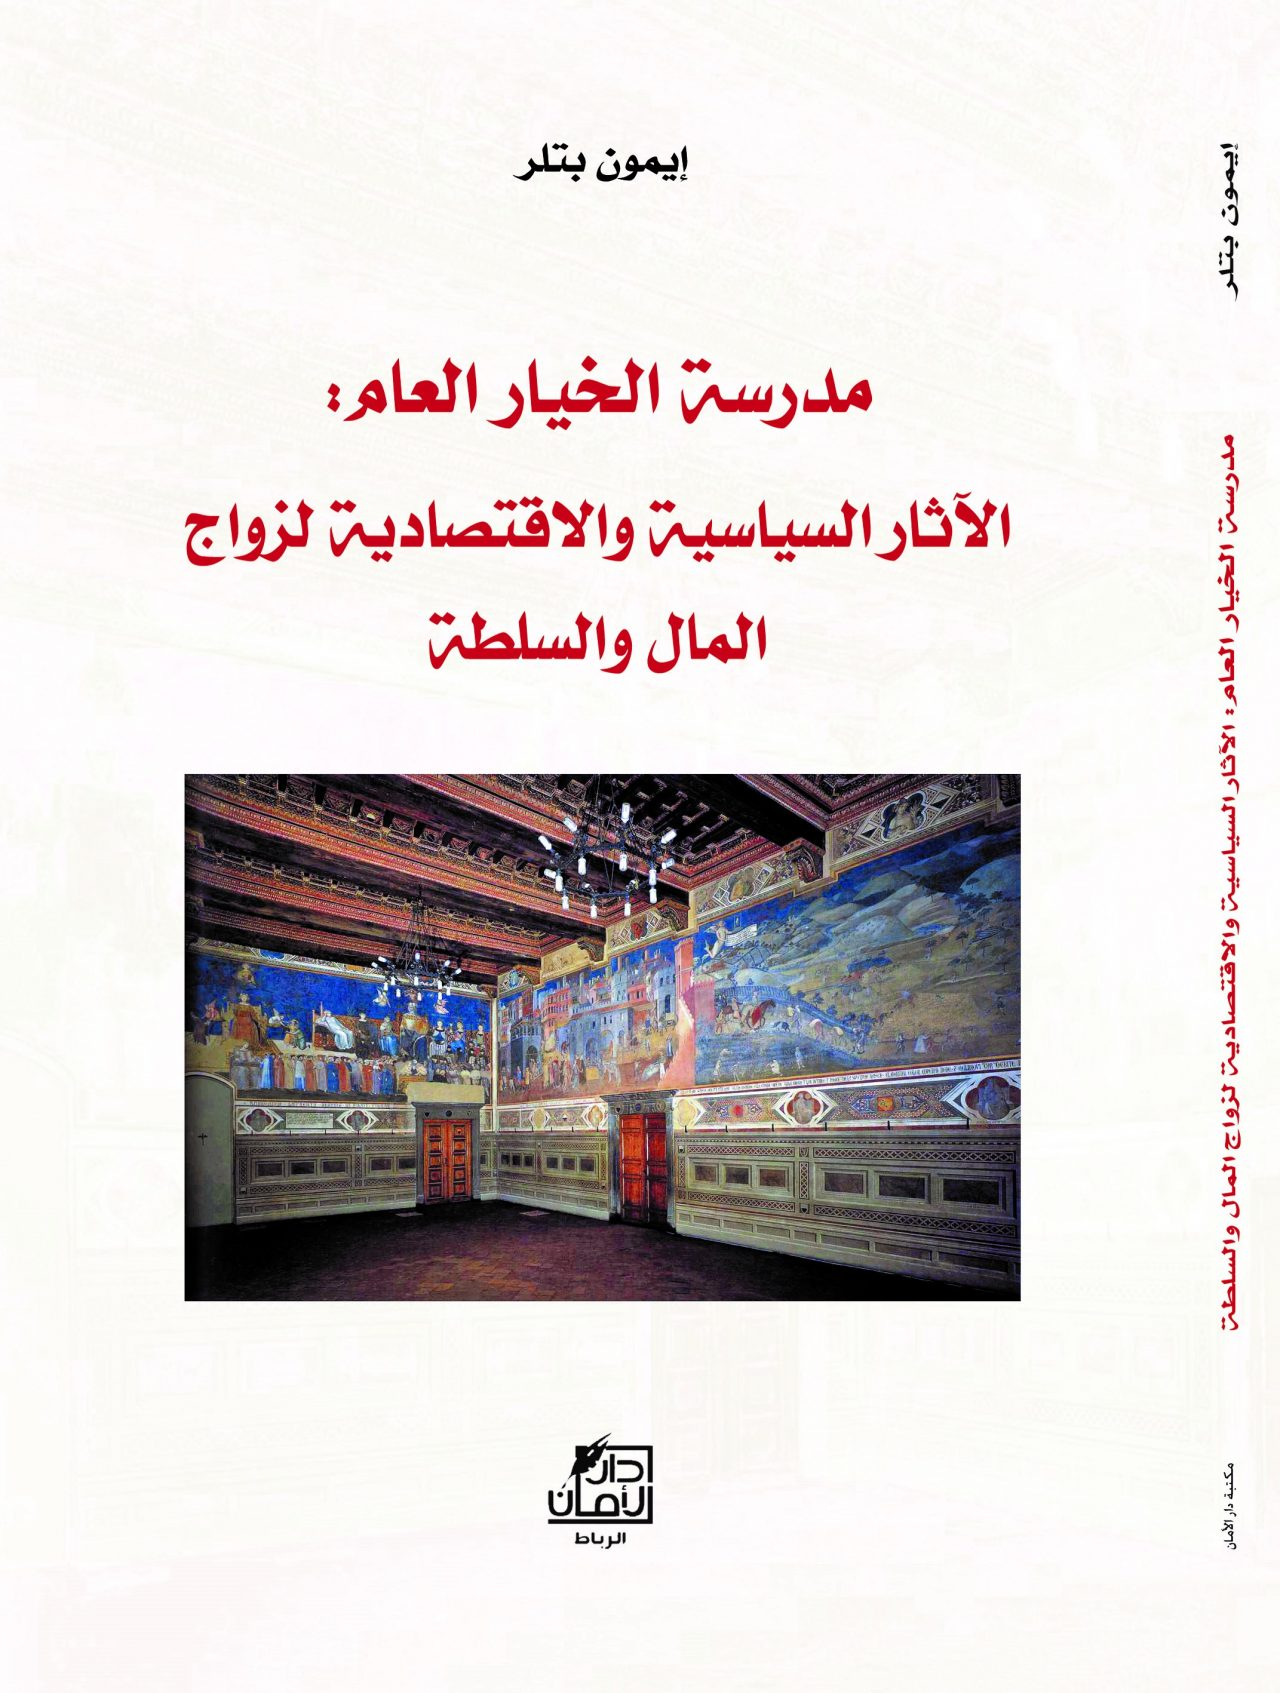 couverture-madrassate-kheyar-amane-1280x1693.jpg